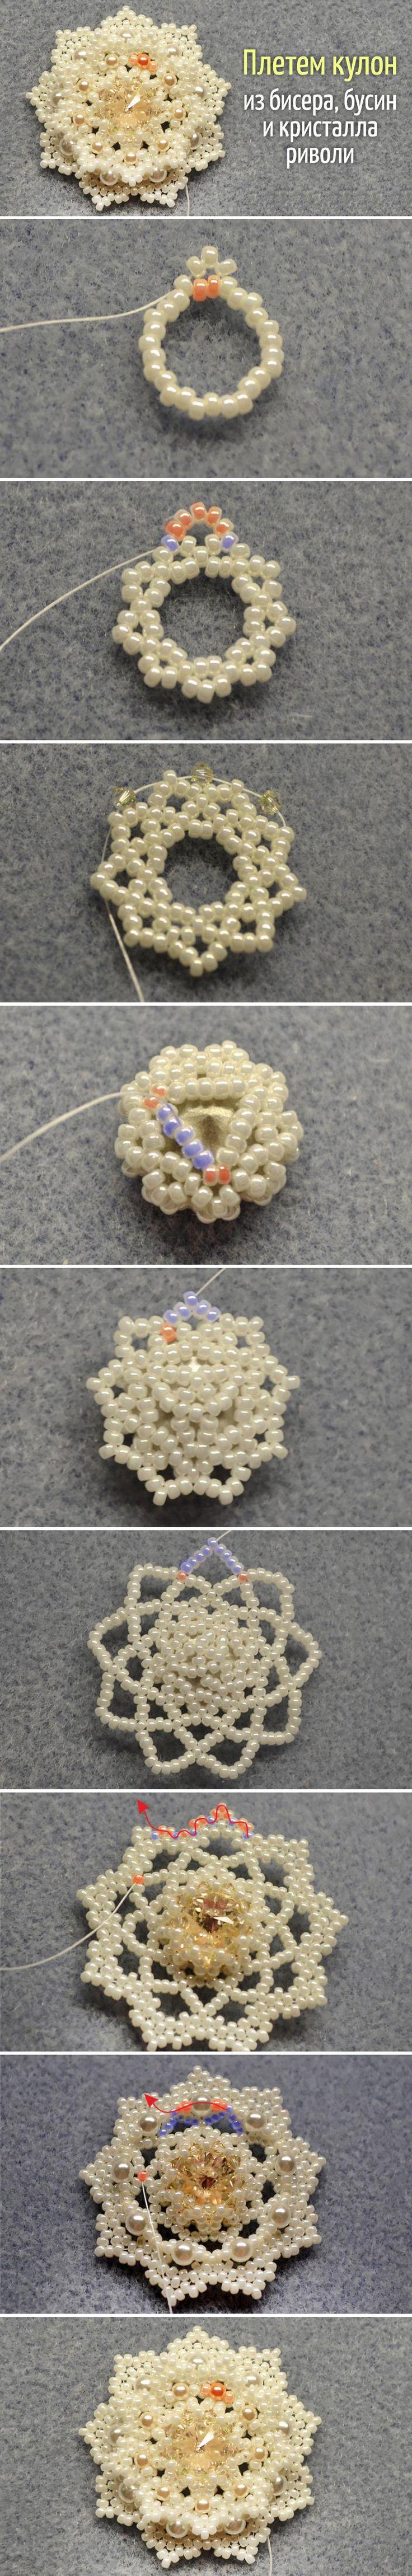 Плетем красивый кулон из бисера, бусин и кристалла риволи #beadweaving #diy #tutorial #beads